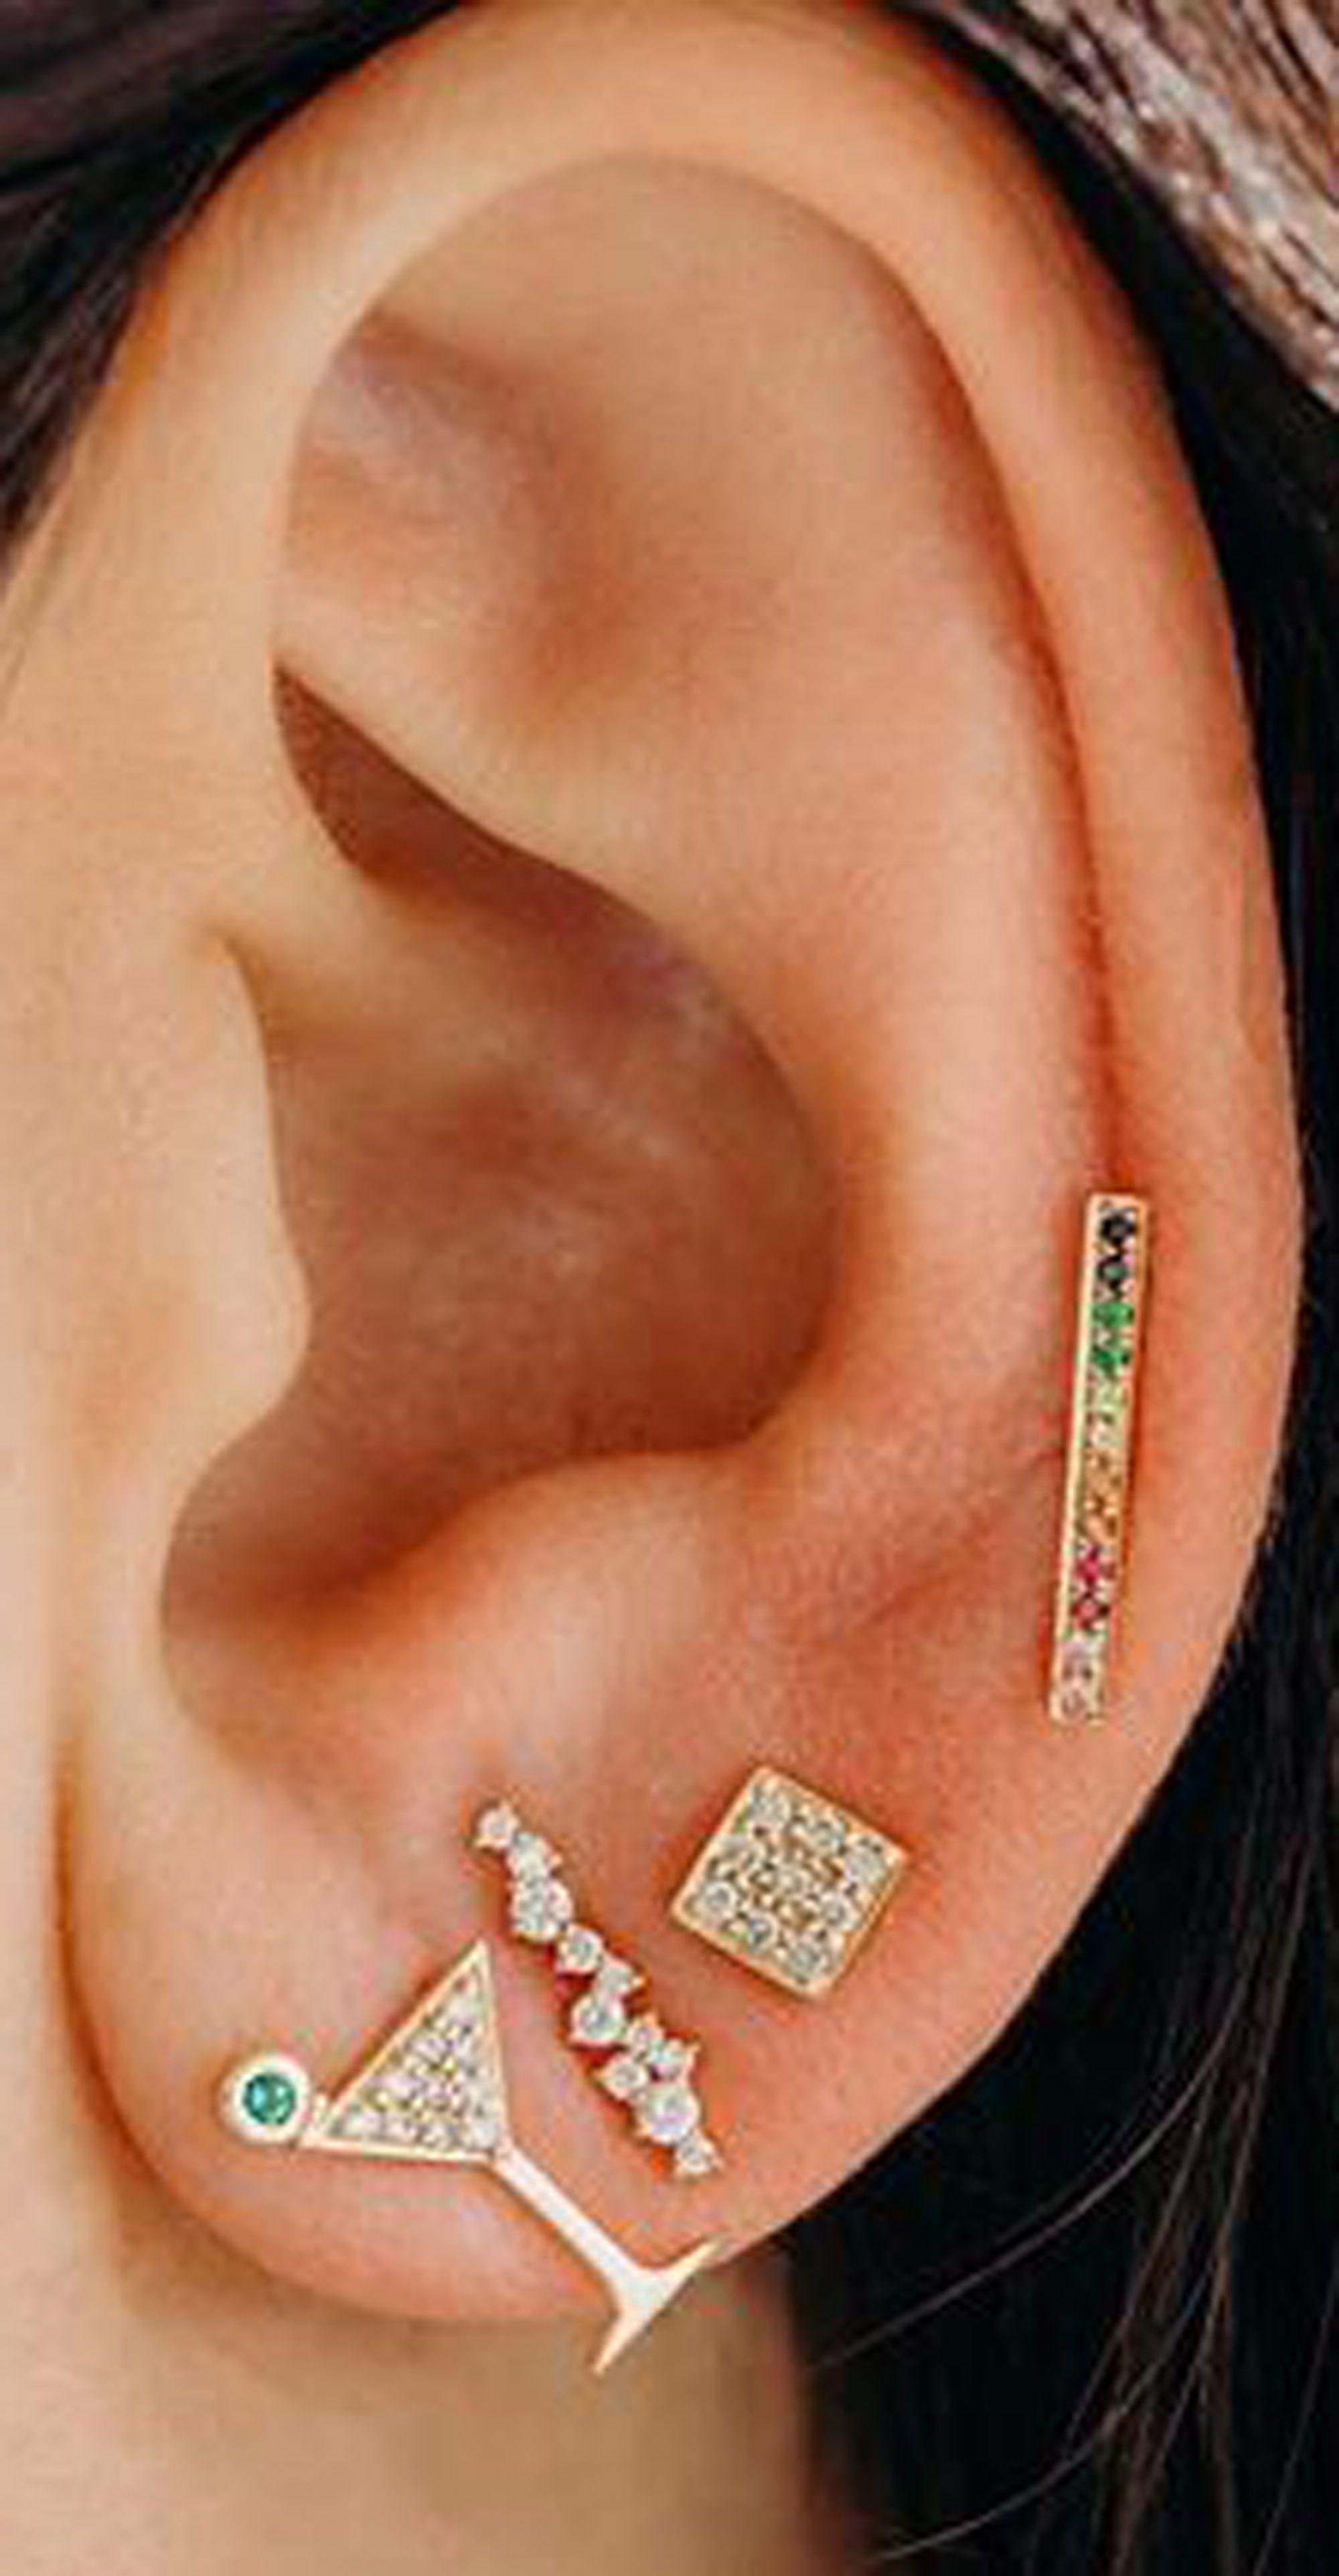 Piercing ideas for girls  Cupcake Rainbow Studs u Colorful Crystals Straight Ear Climber